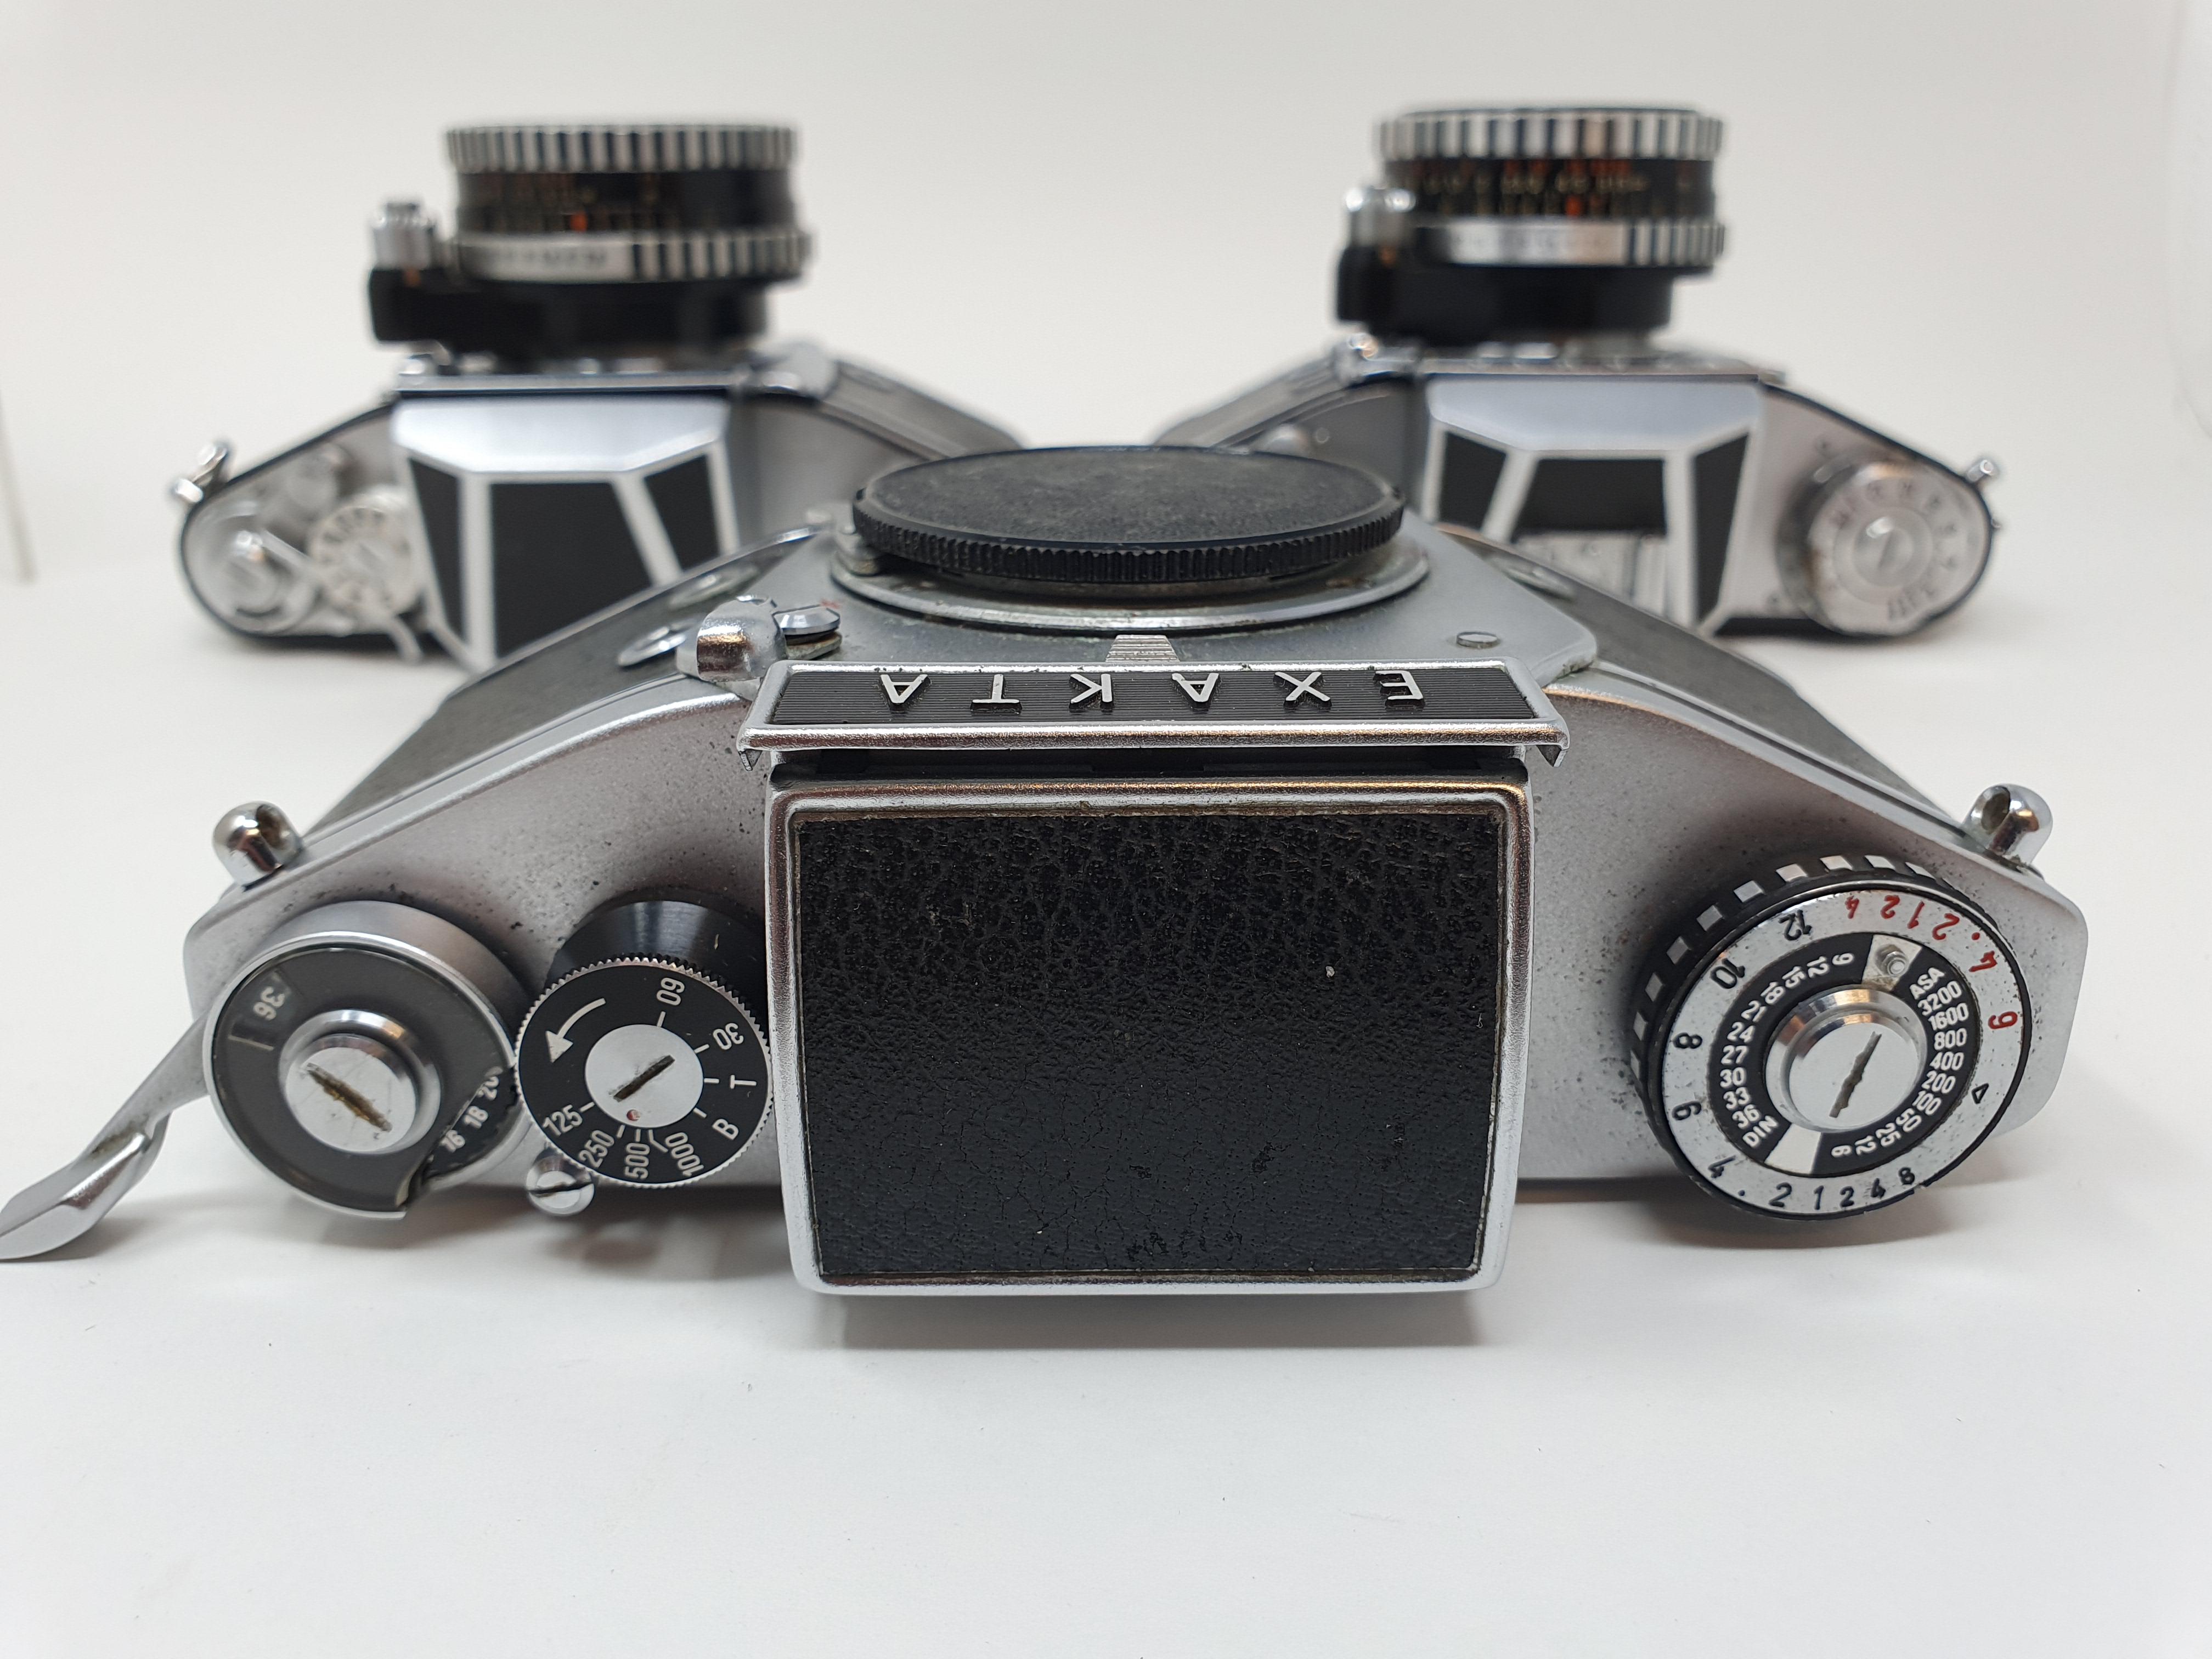 An Exakta Varex 11a camera, a VX 1000 camera body and a Varex IIb camera (3) Provenance: Part of a - Image 5 of 6